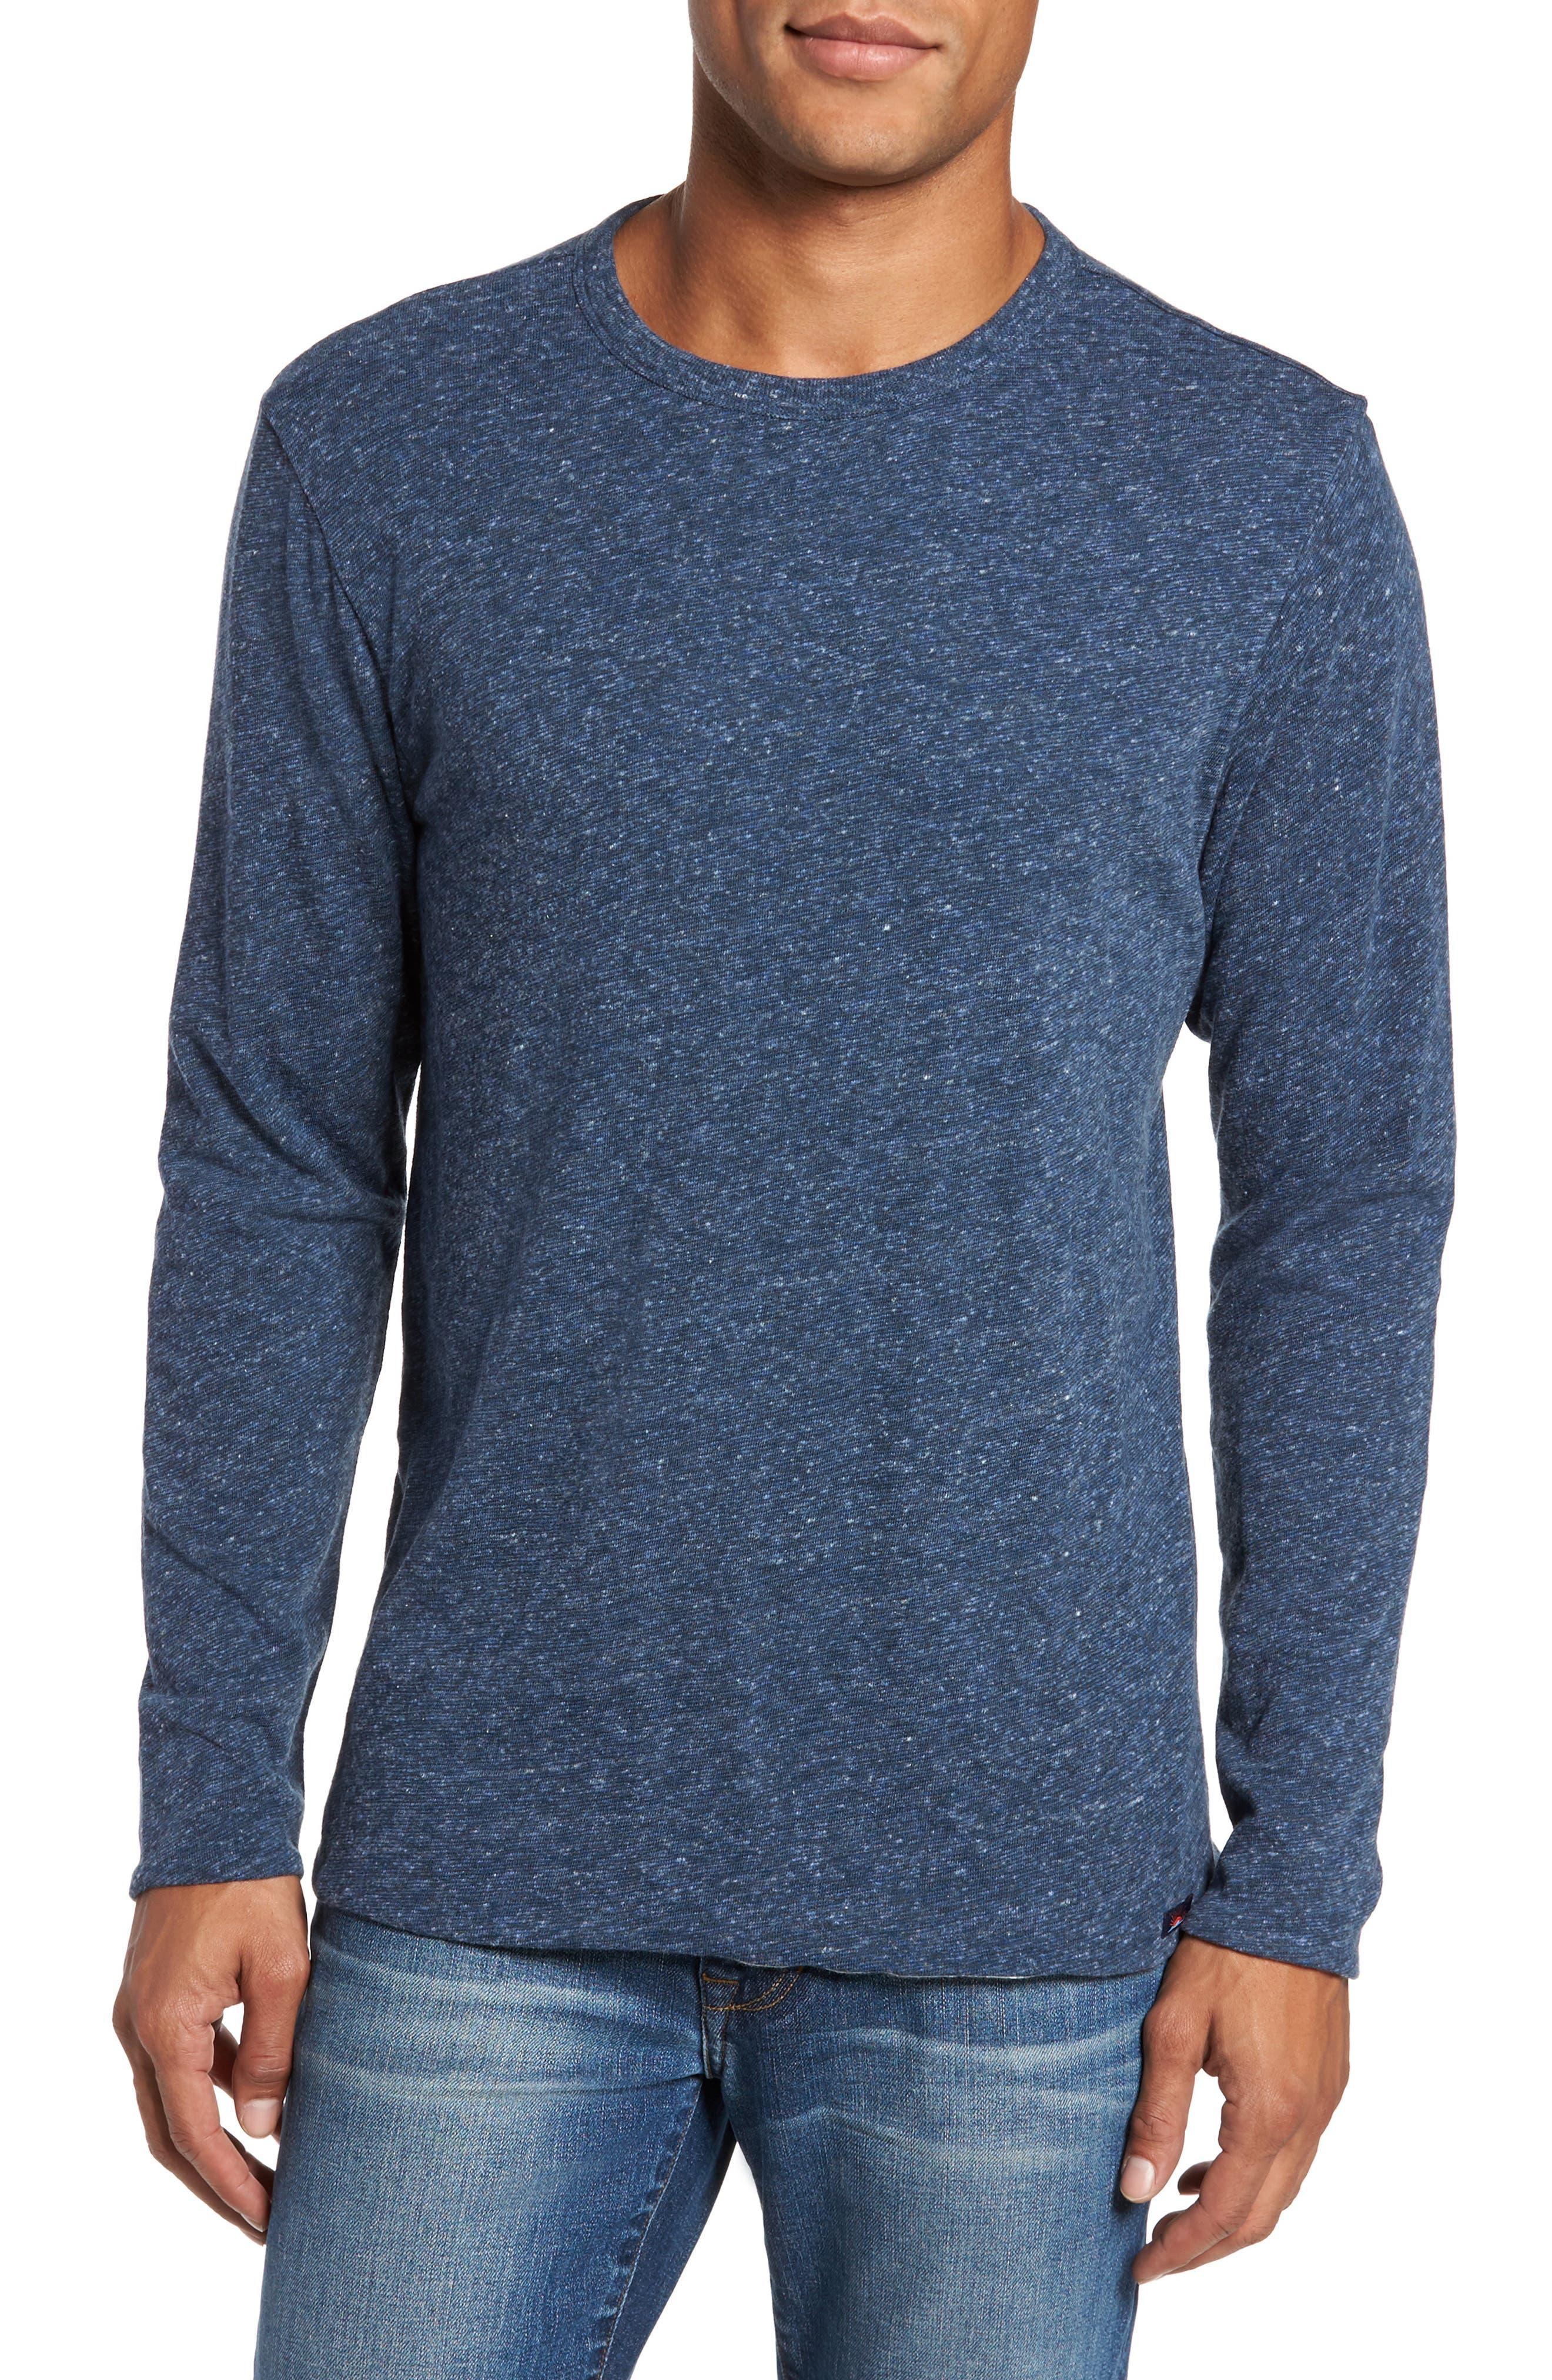 Alternate Image 1 Selected - Faherty Heathered Reversible Long Sleeve Crewneck T-Shirt